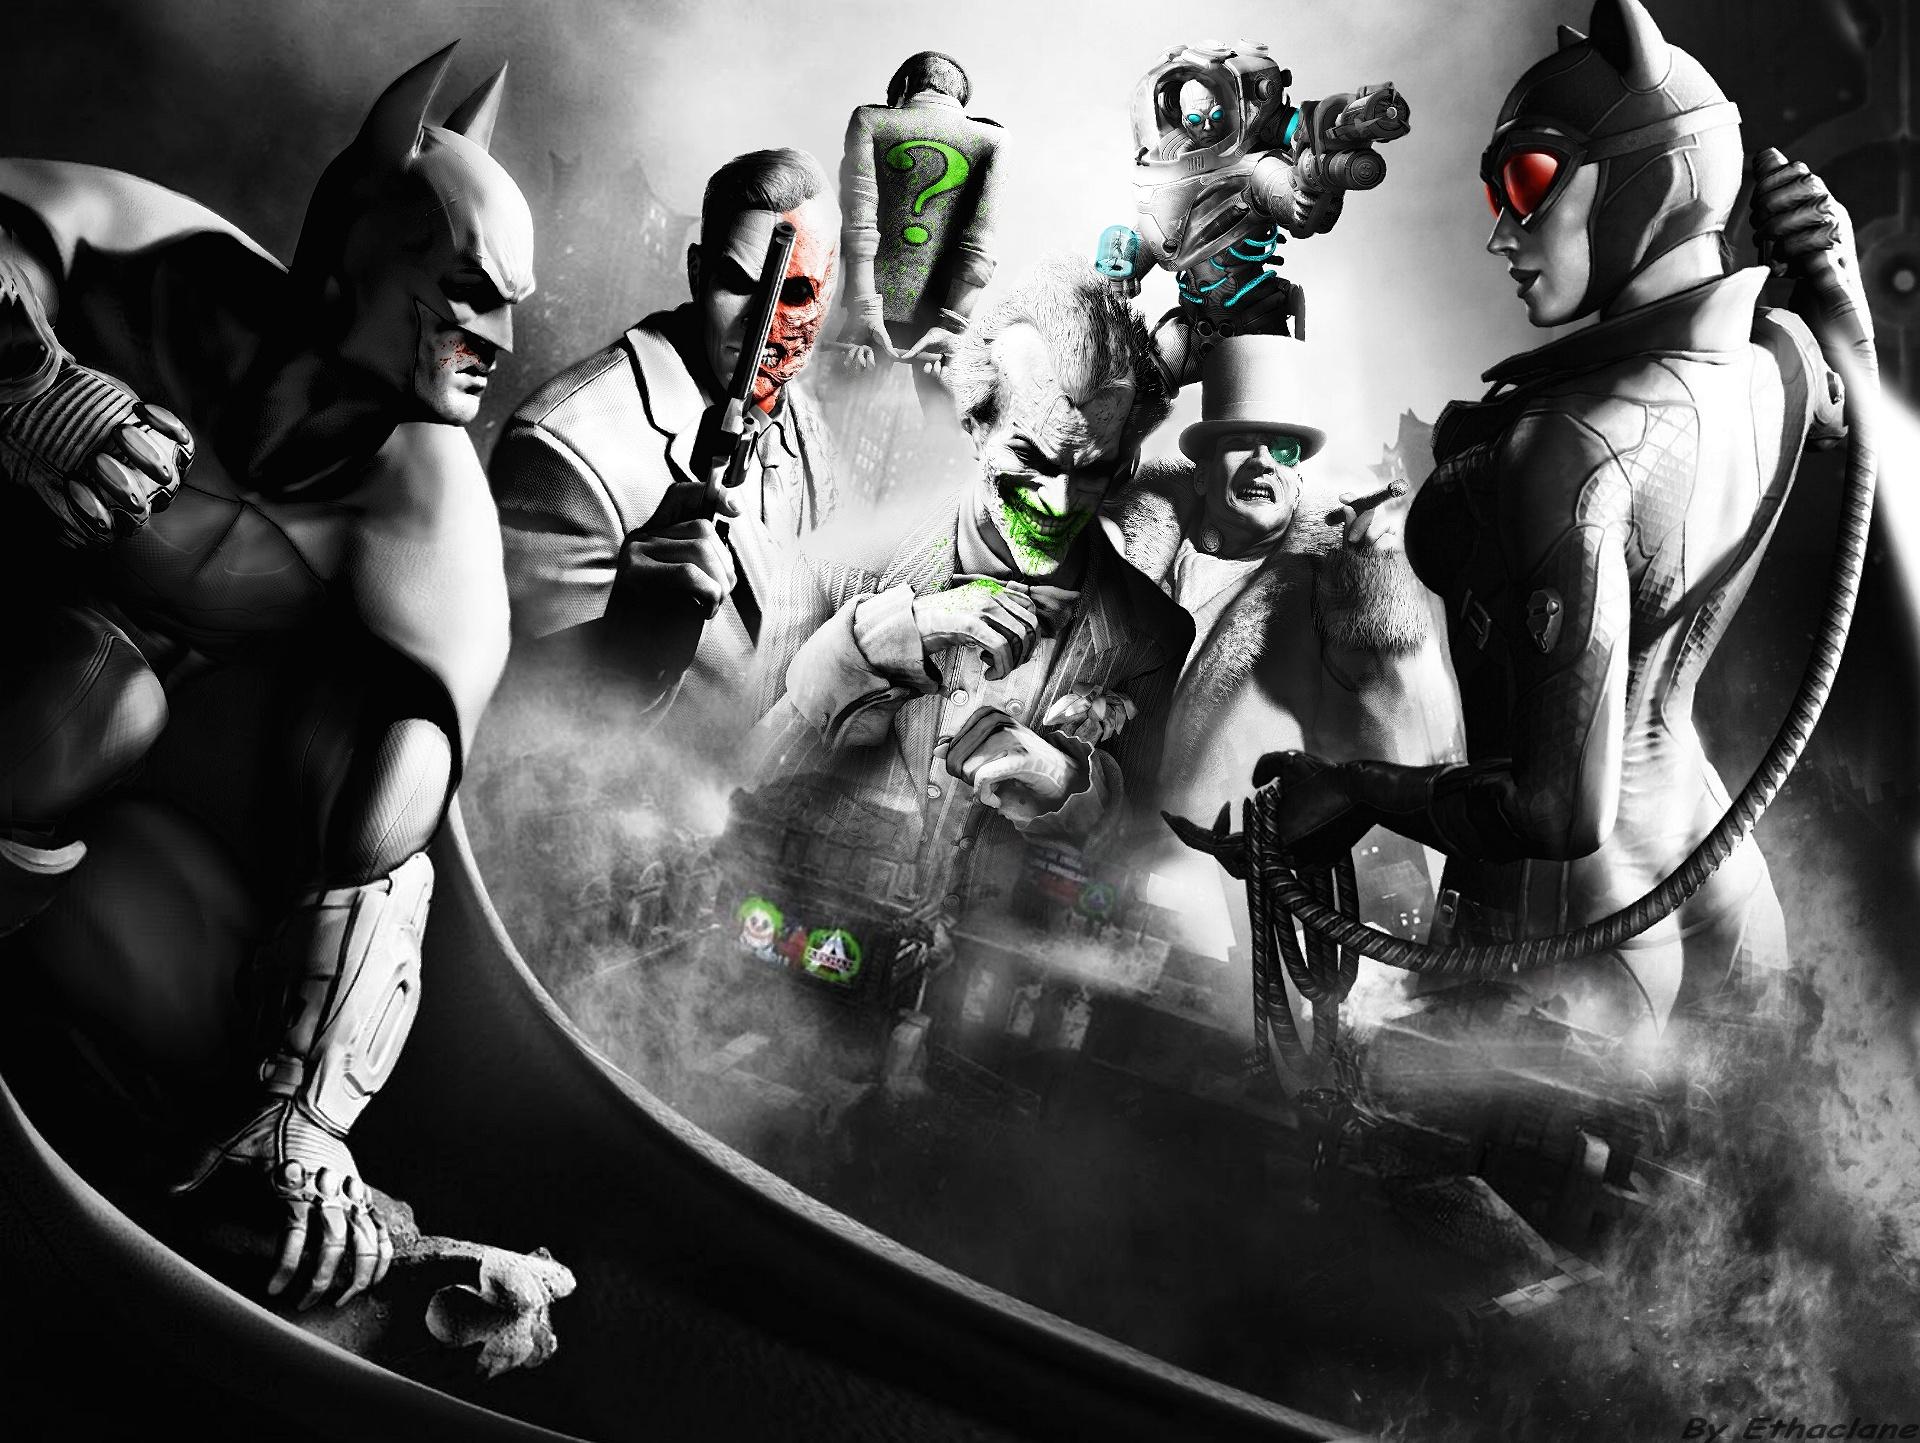 Batman Arkham City Wallpaper 2 By Ethaclane On Deviantart